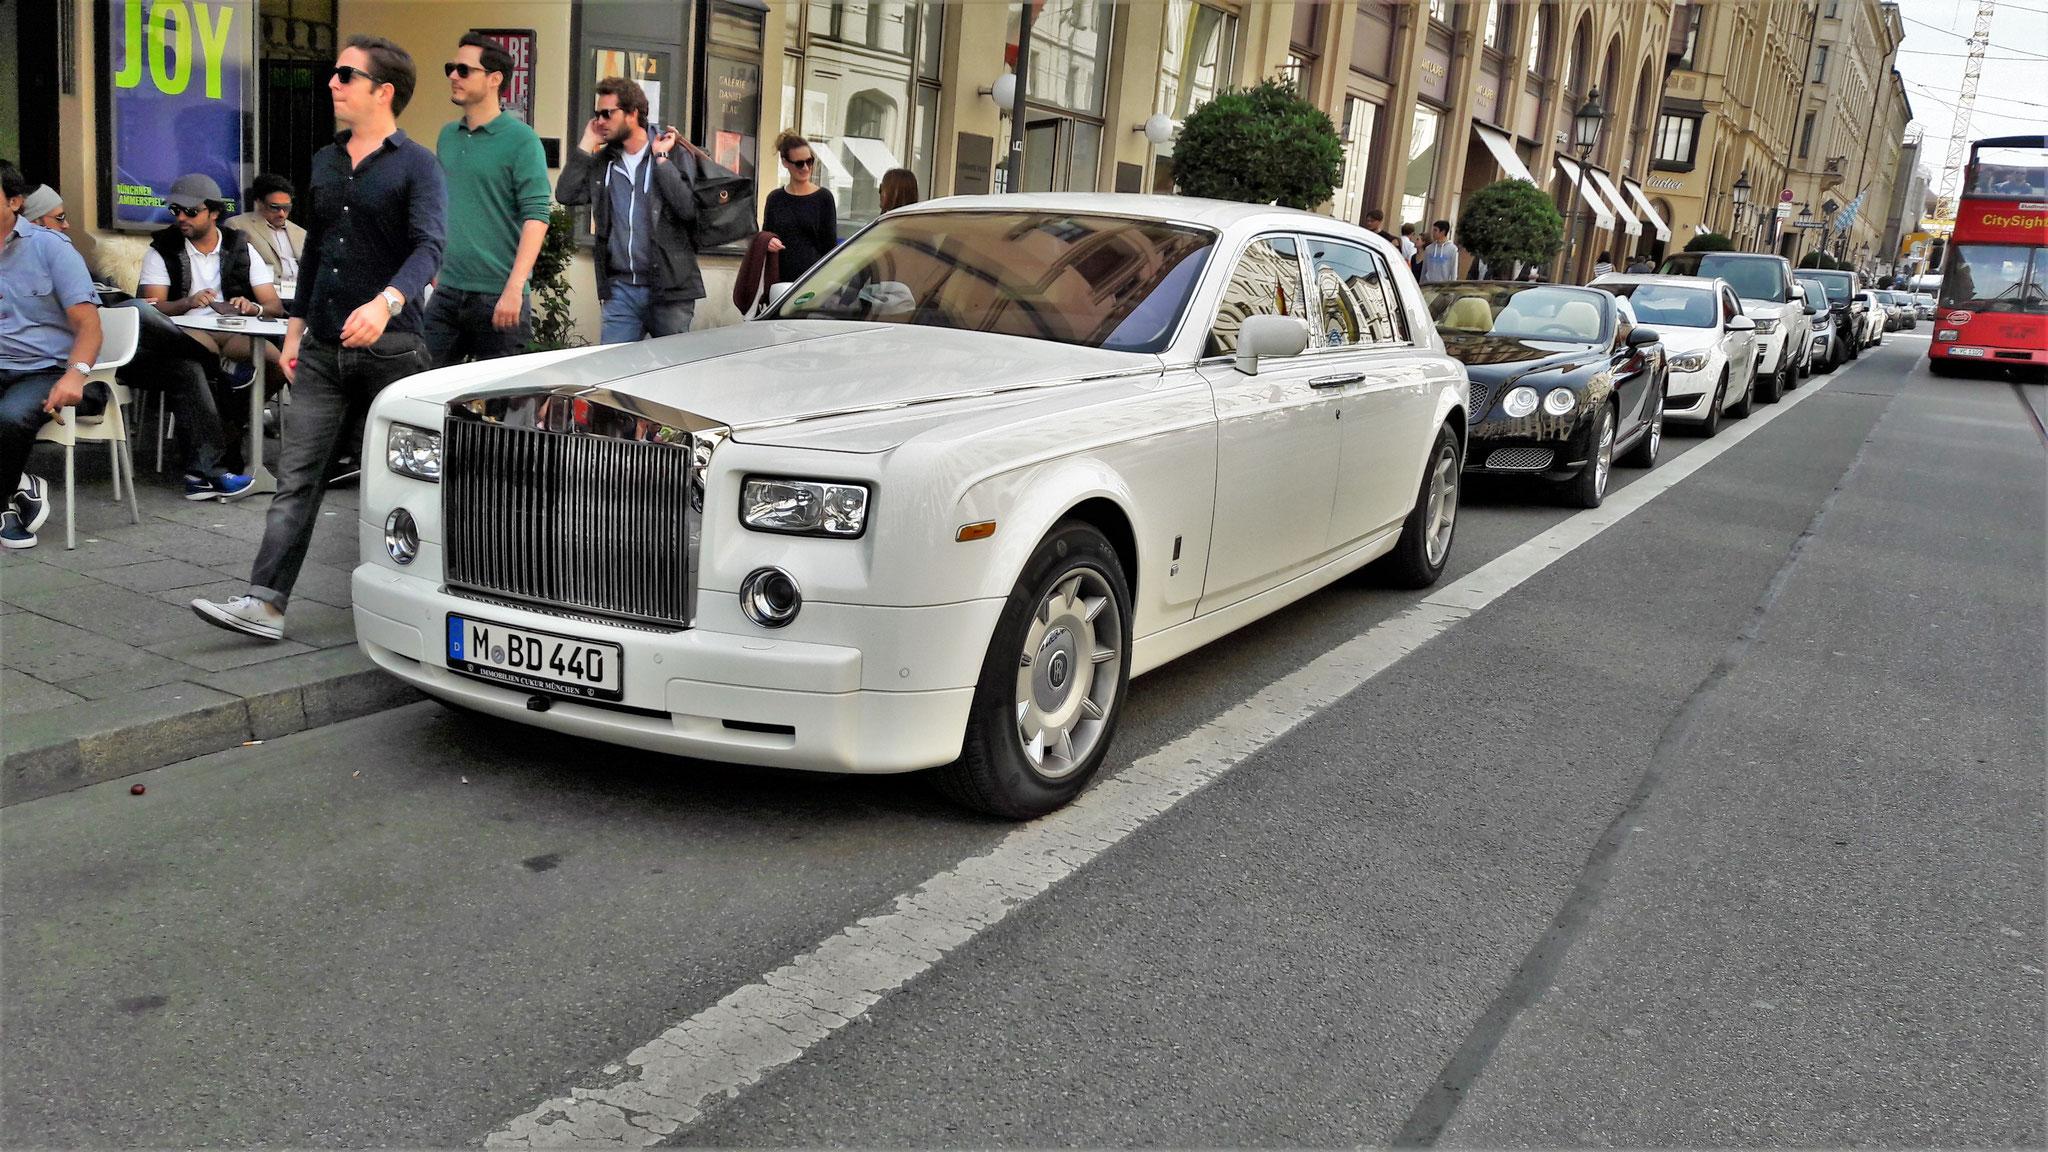 Rolls Royce Phantom EWB - M-BD-440